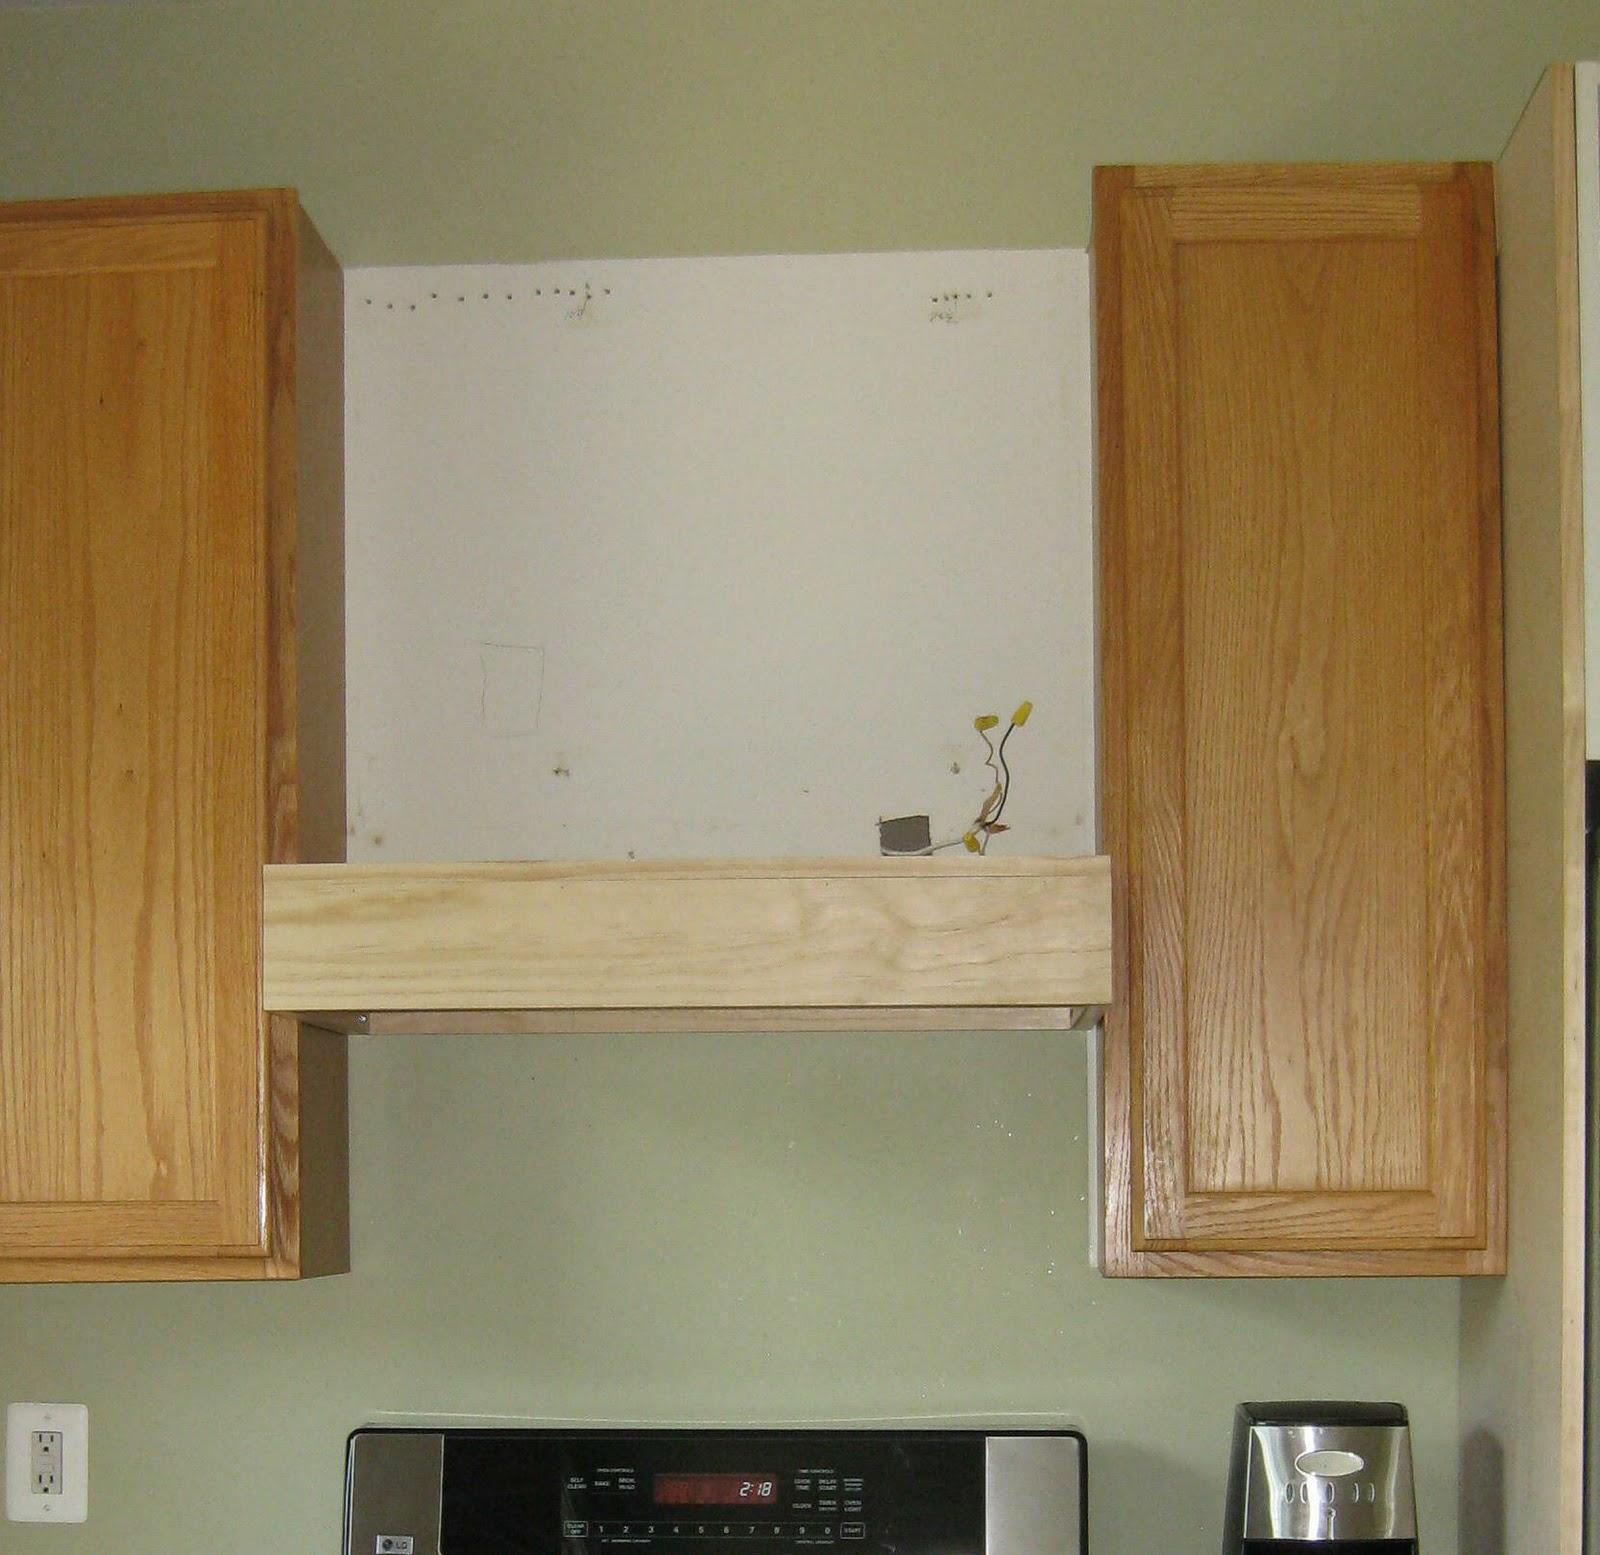 Diy Kitchen Fan: How To Build A Range Hood